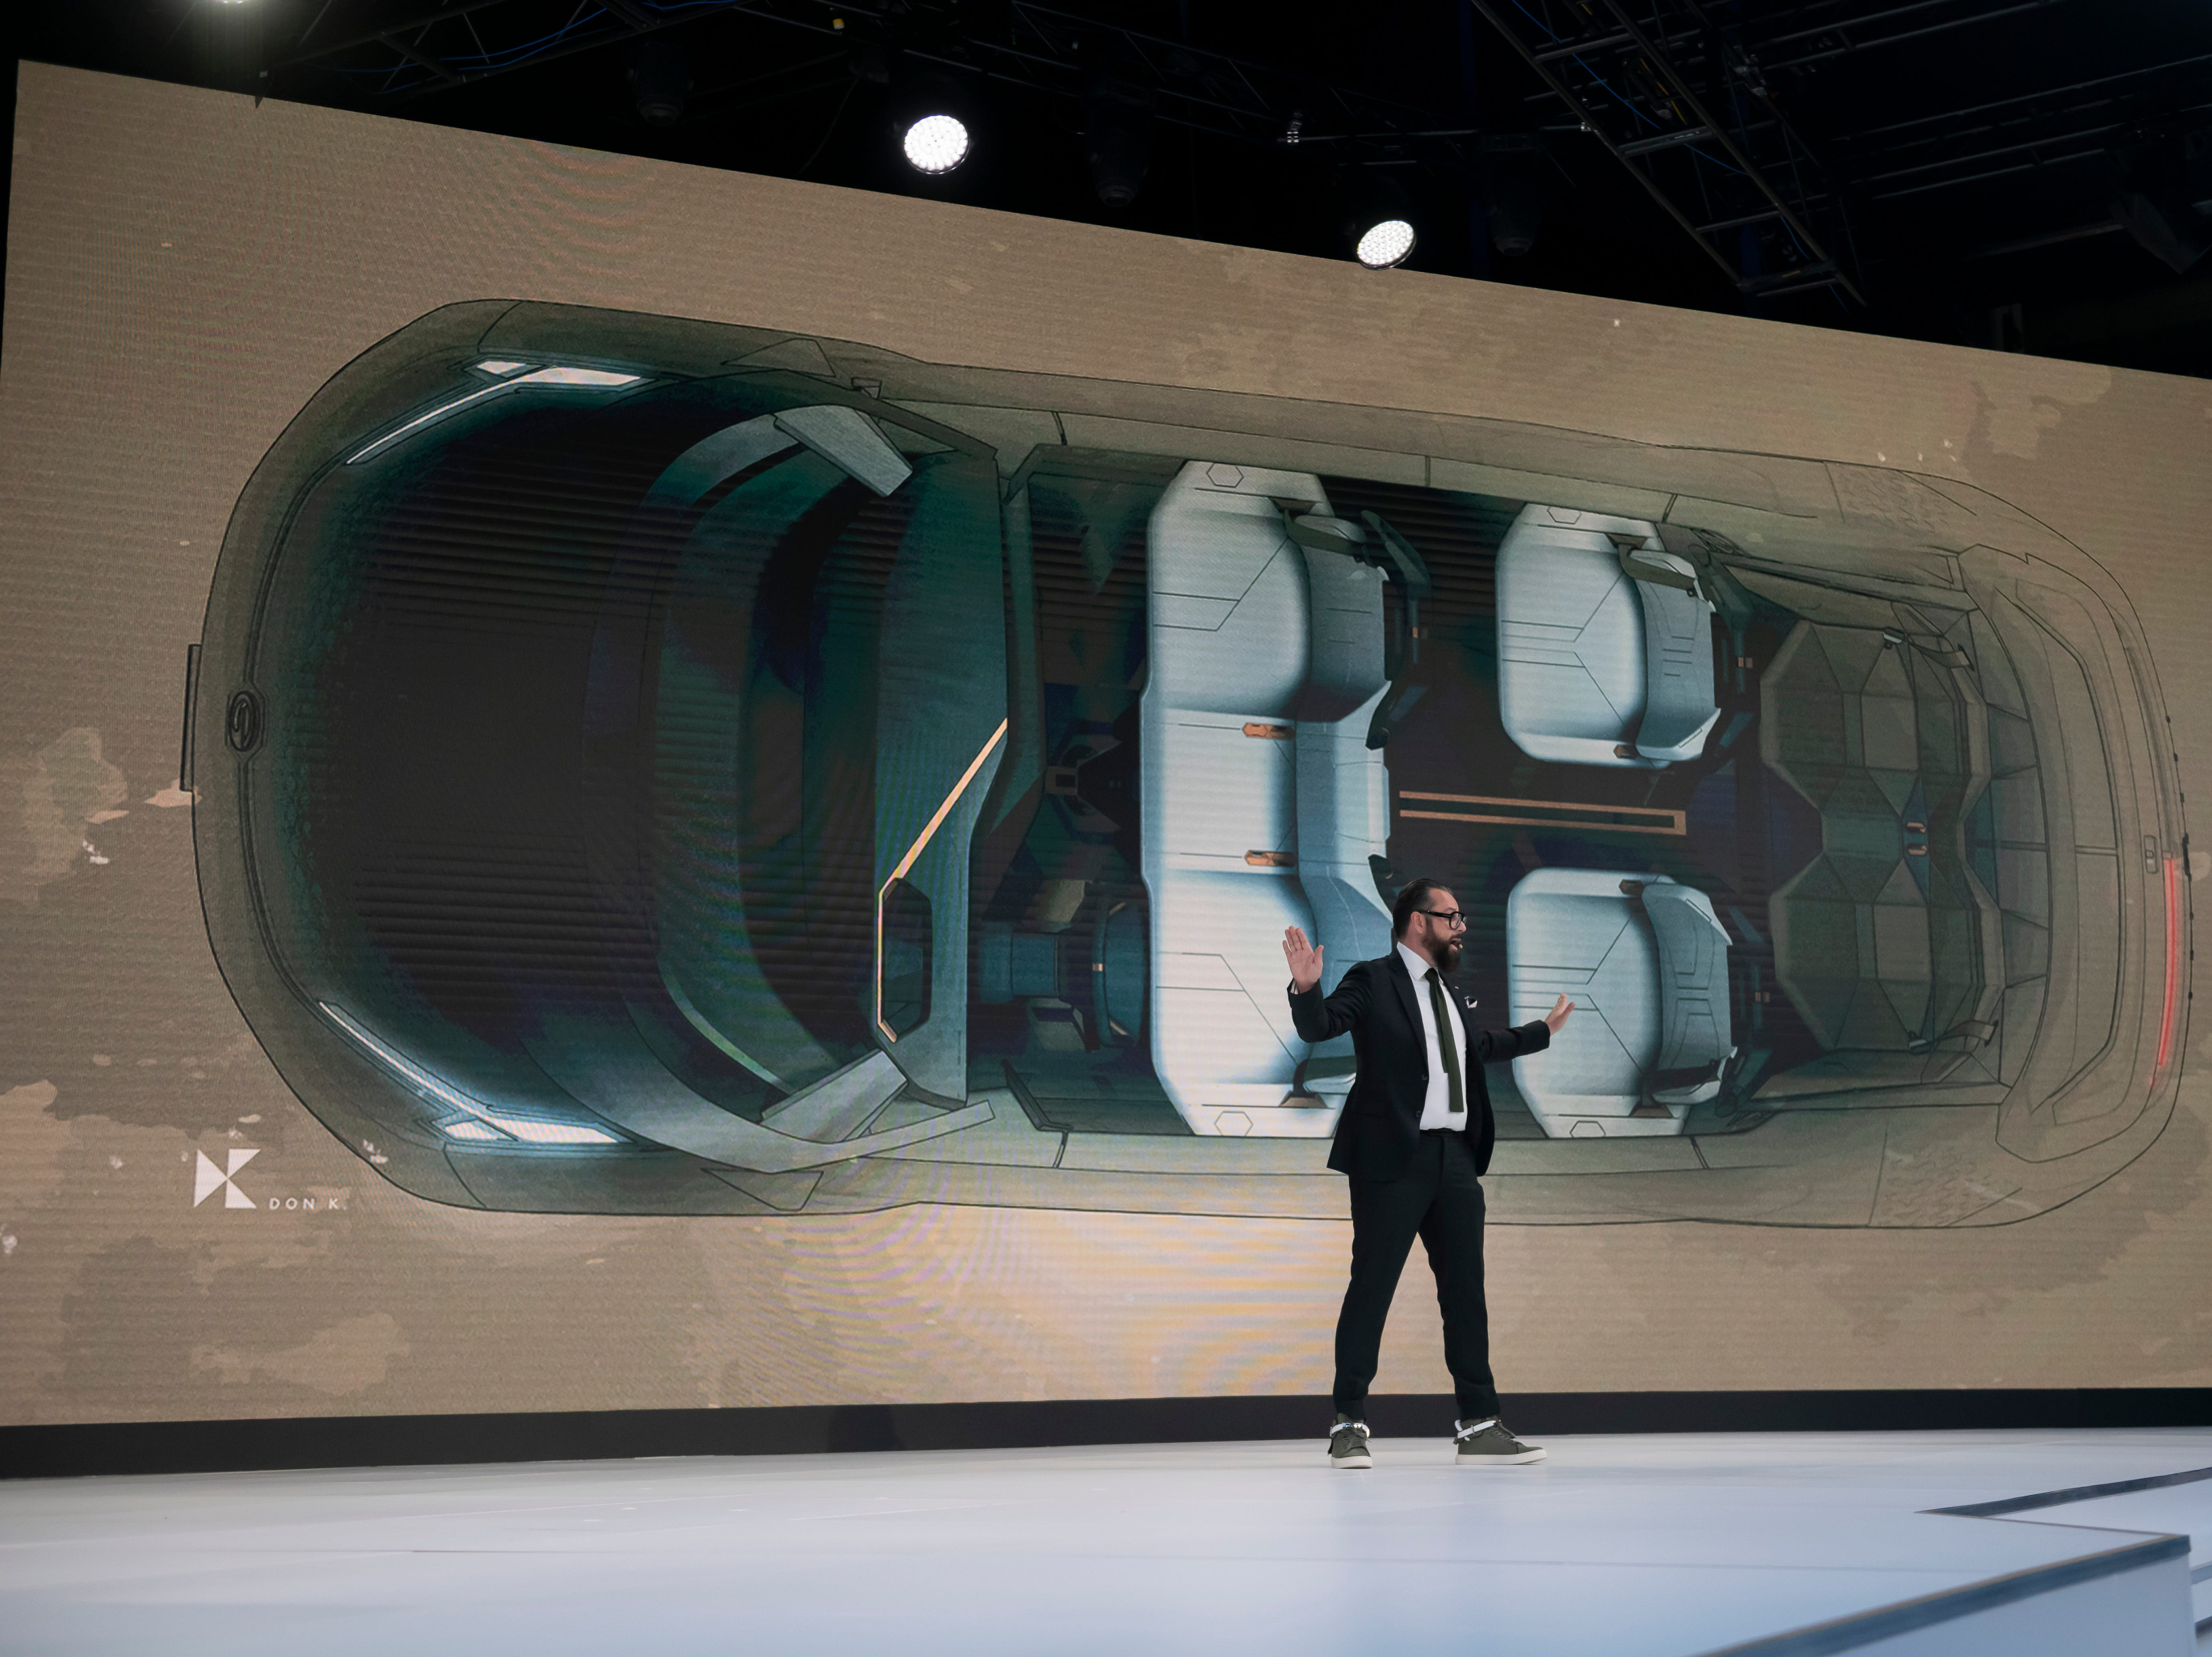 Pontus Fontaeus, executive design director of the GAC advanced design department in Los Angeles, talks about the GAC Entranze EV concept vehicle.